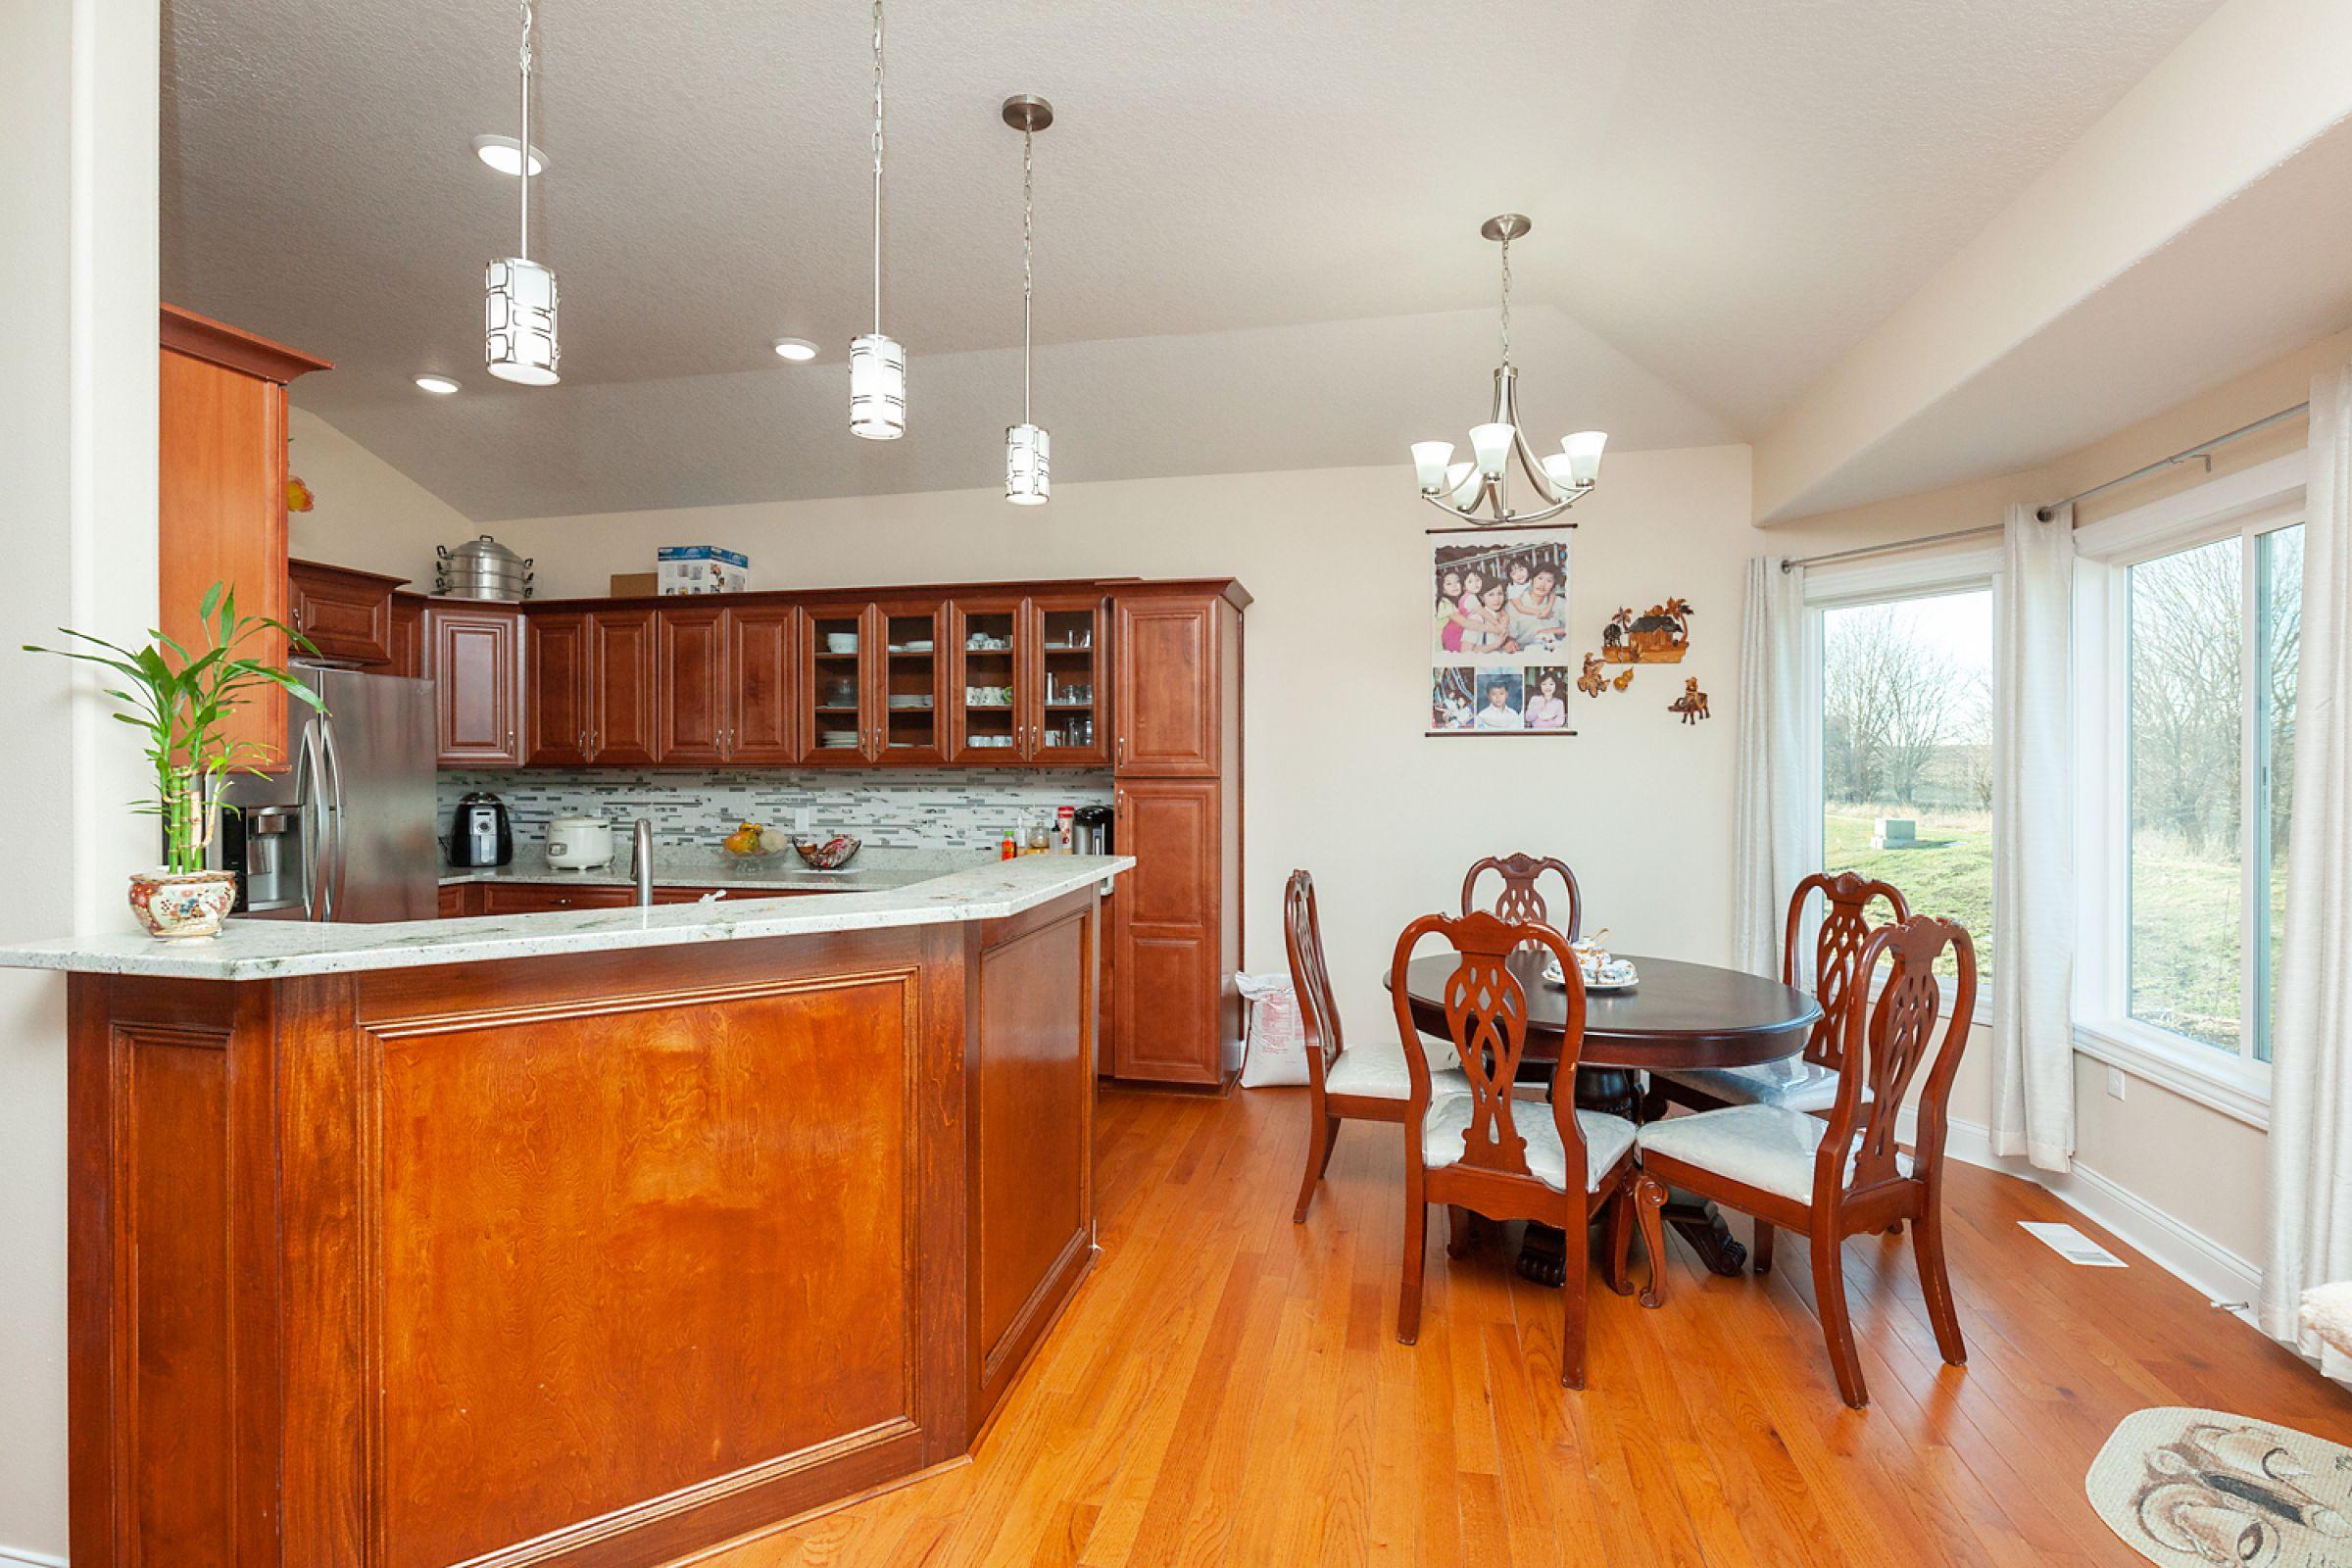 residential-polk-county-iowa-0-acres-listing-number-15403-1-2021-03-12-053306.jpg